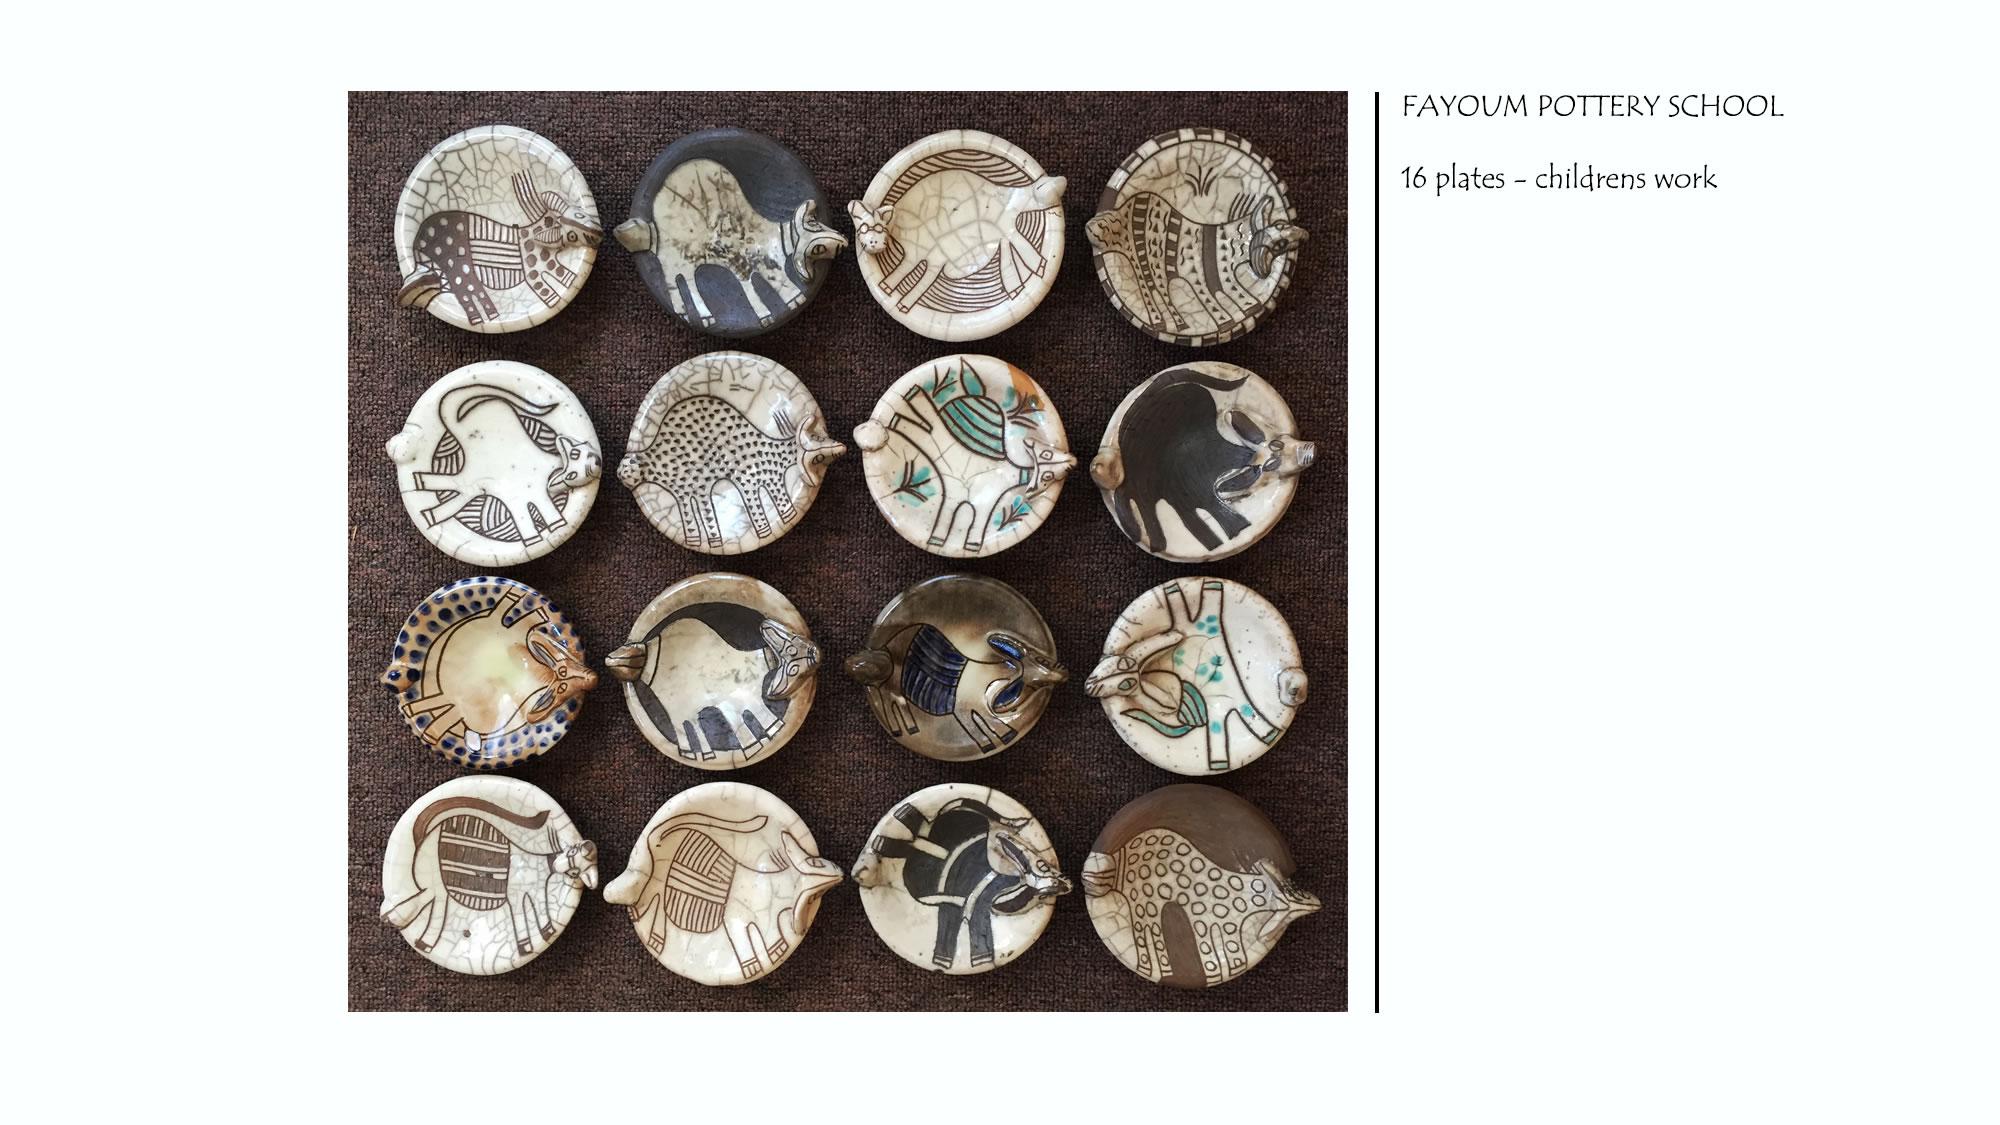 fayoum-pottery-school-05.jpg